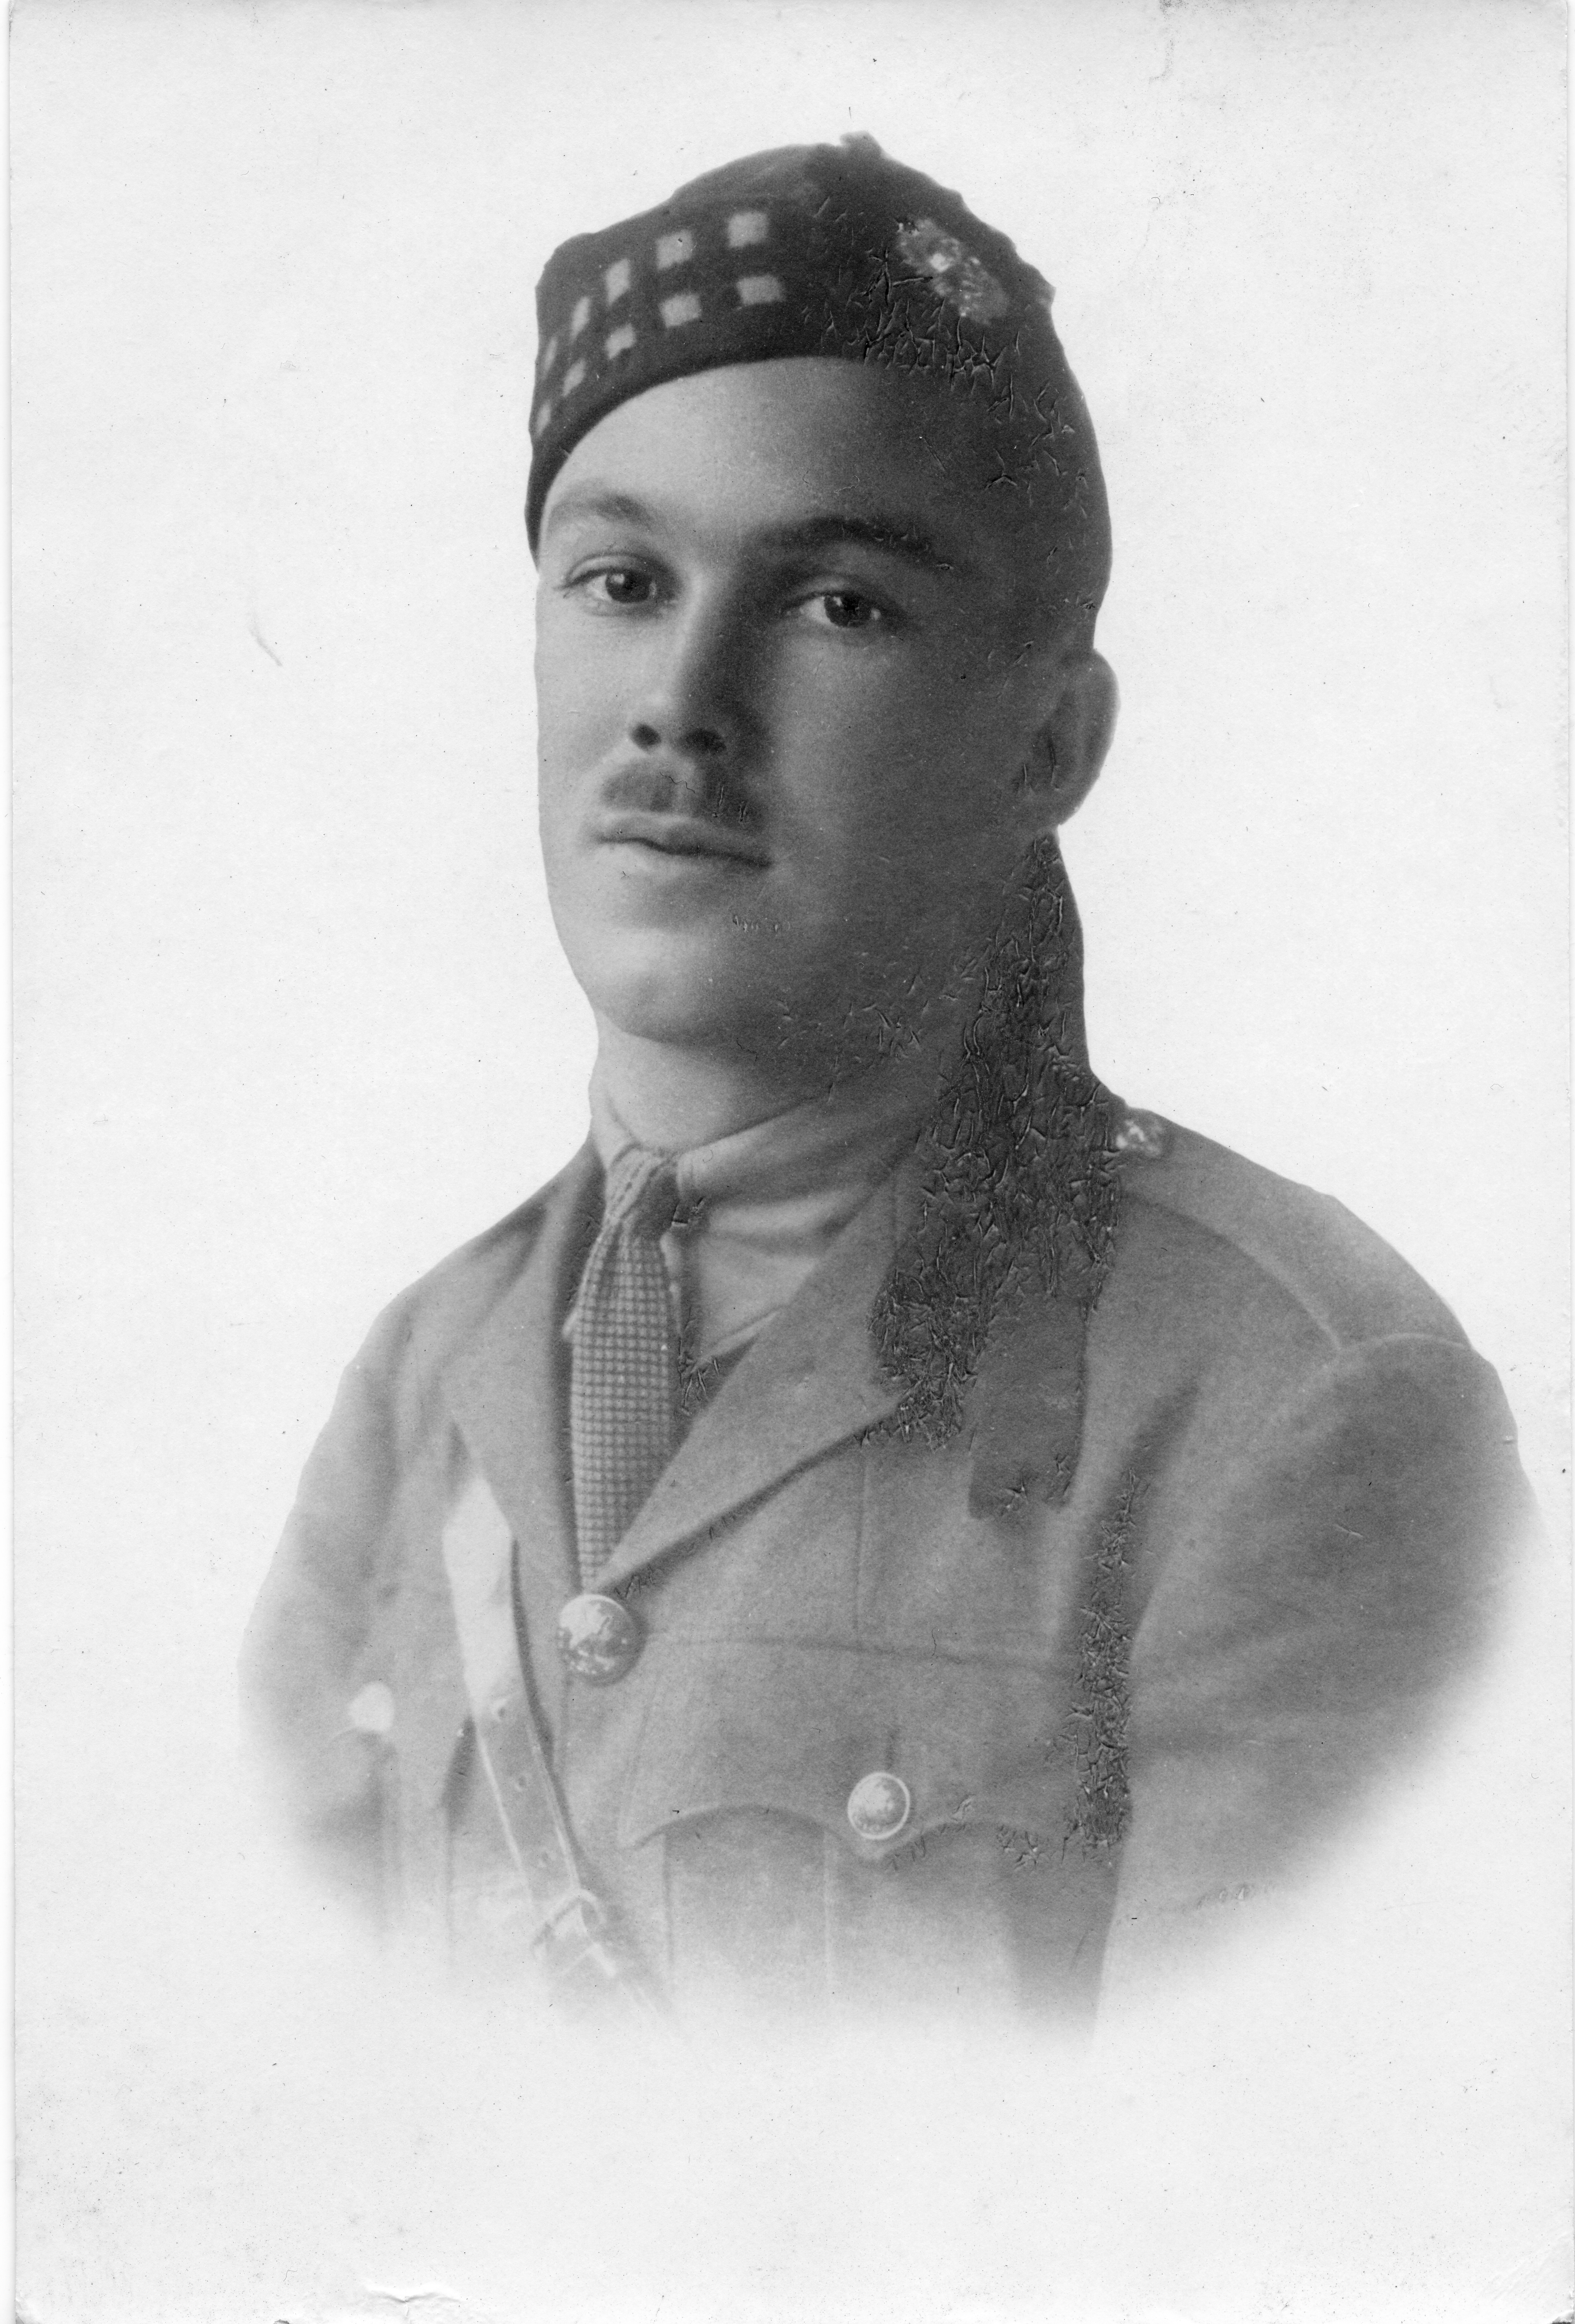 Canadian Fallen Soldier - Second Lieutenant CECIL BERTRAM WHYTE